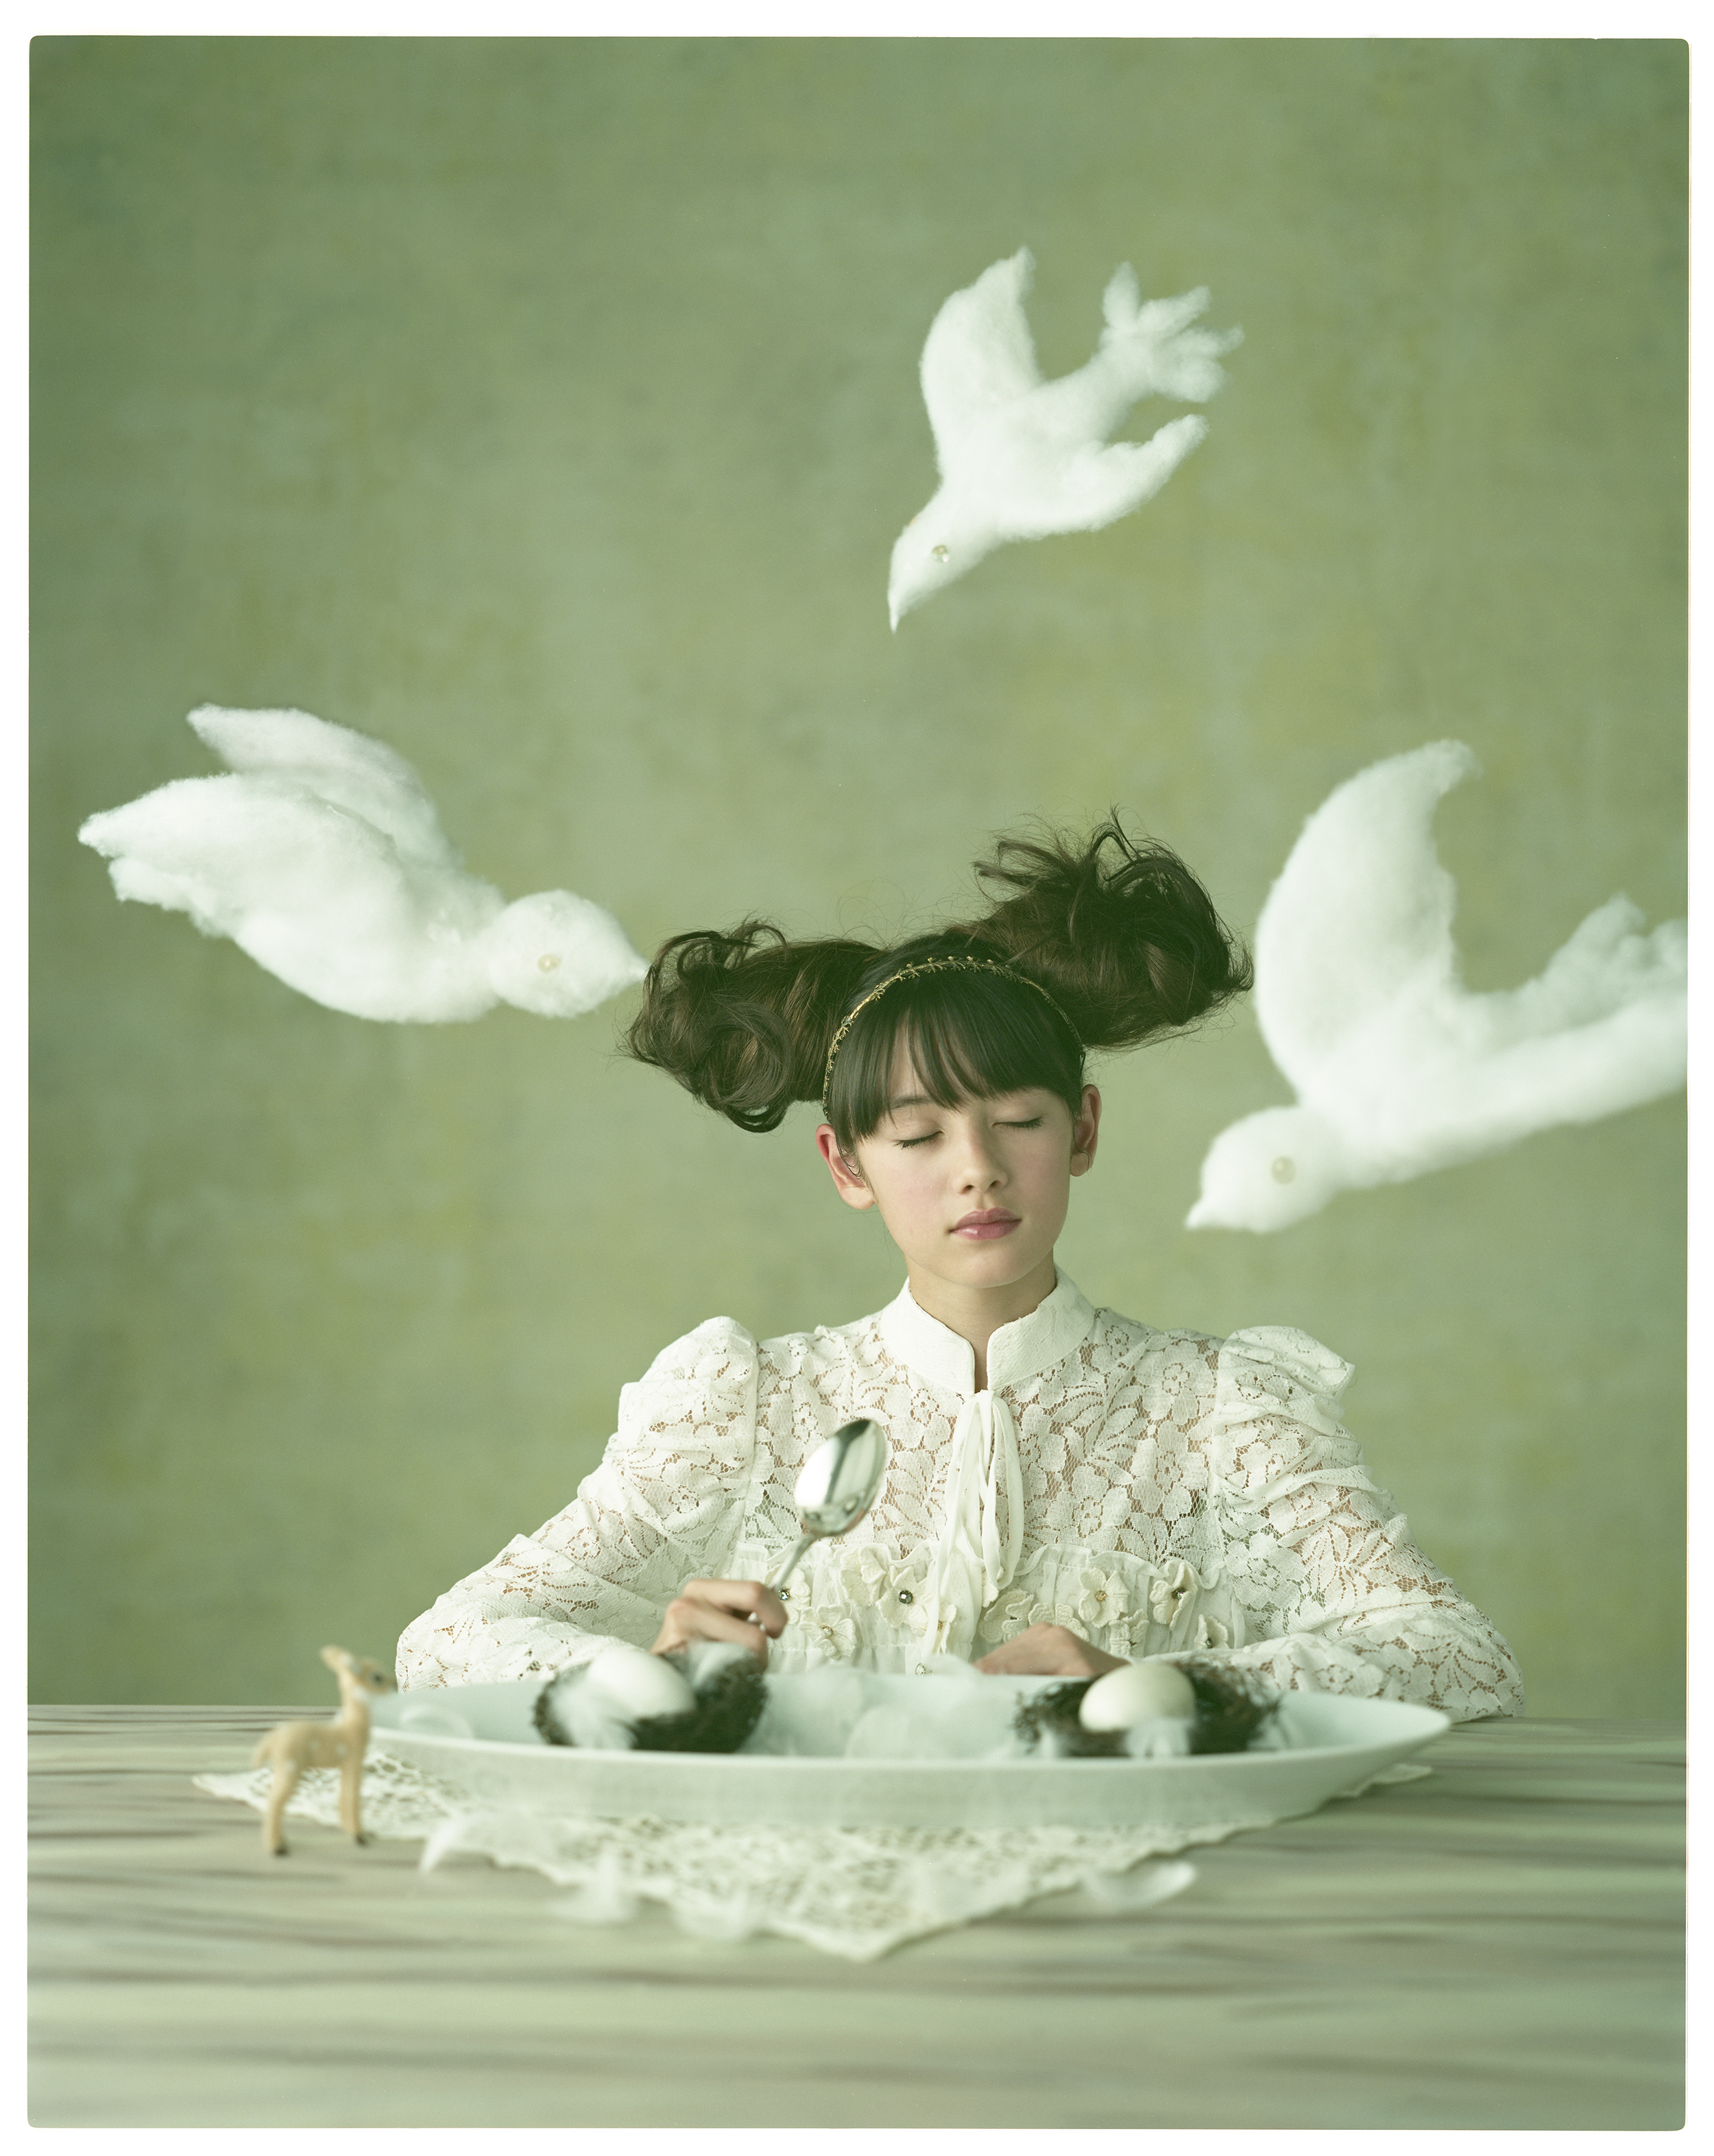 b_white bird